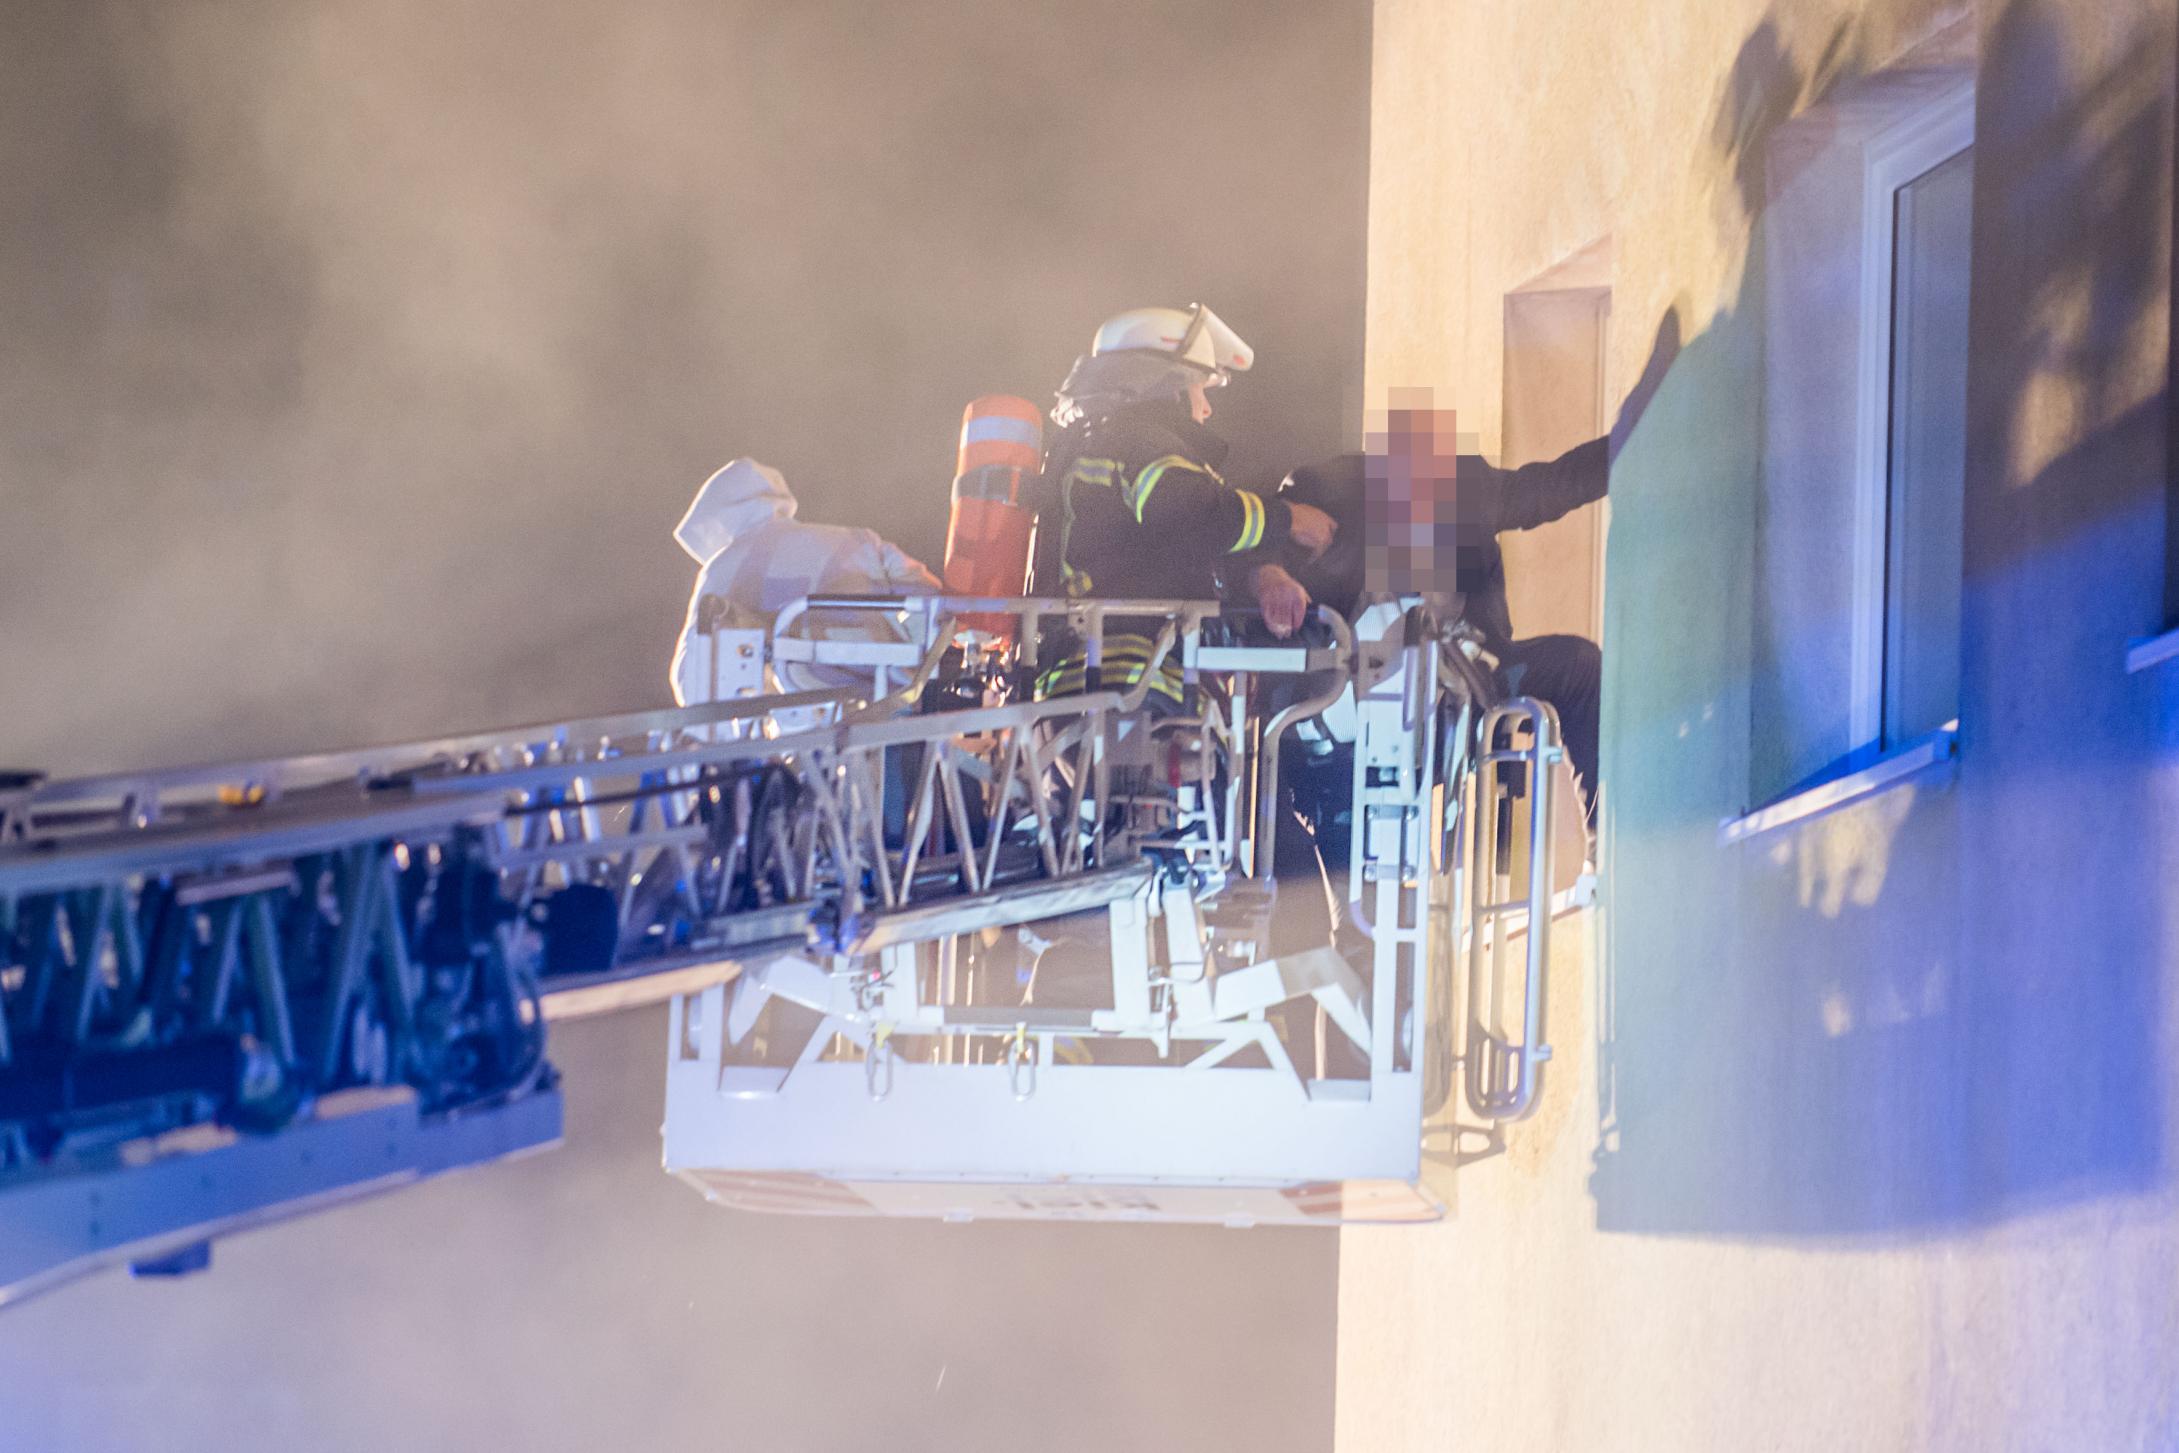 Kellerbrand Feuer Wellingdorf Kiel Feuerwehr rettet Bewohner